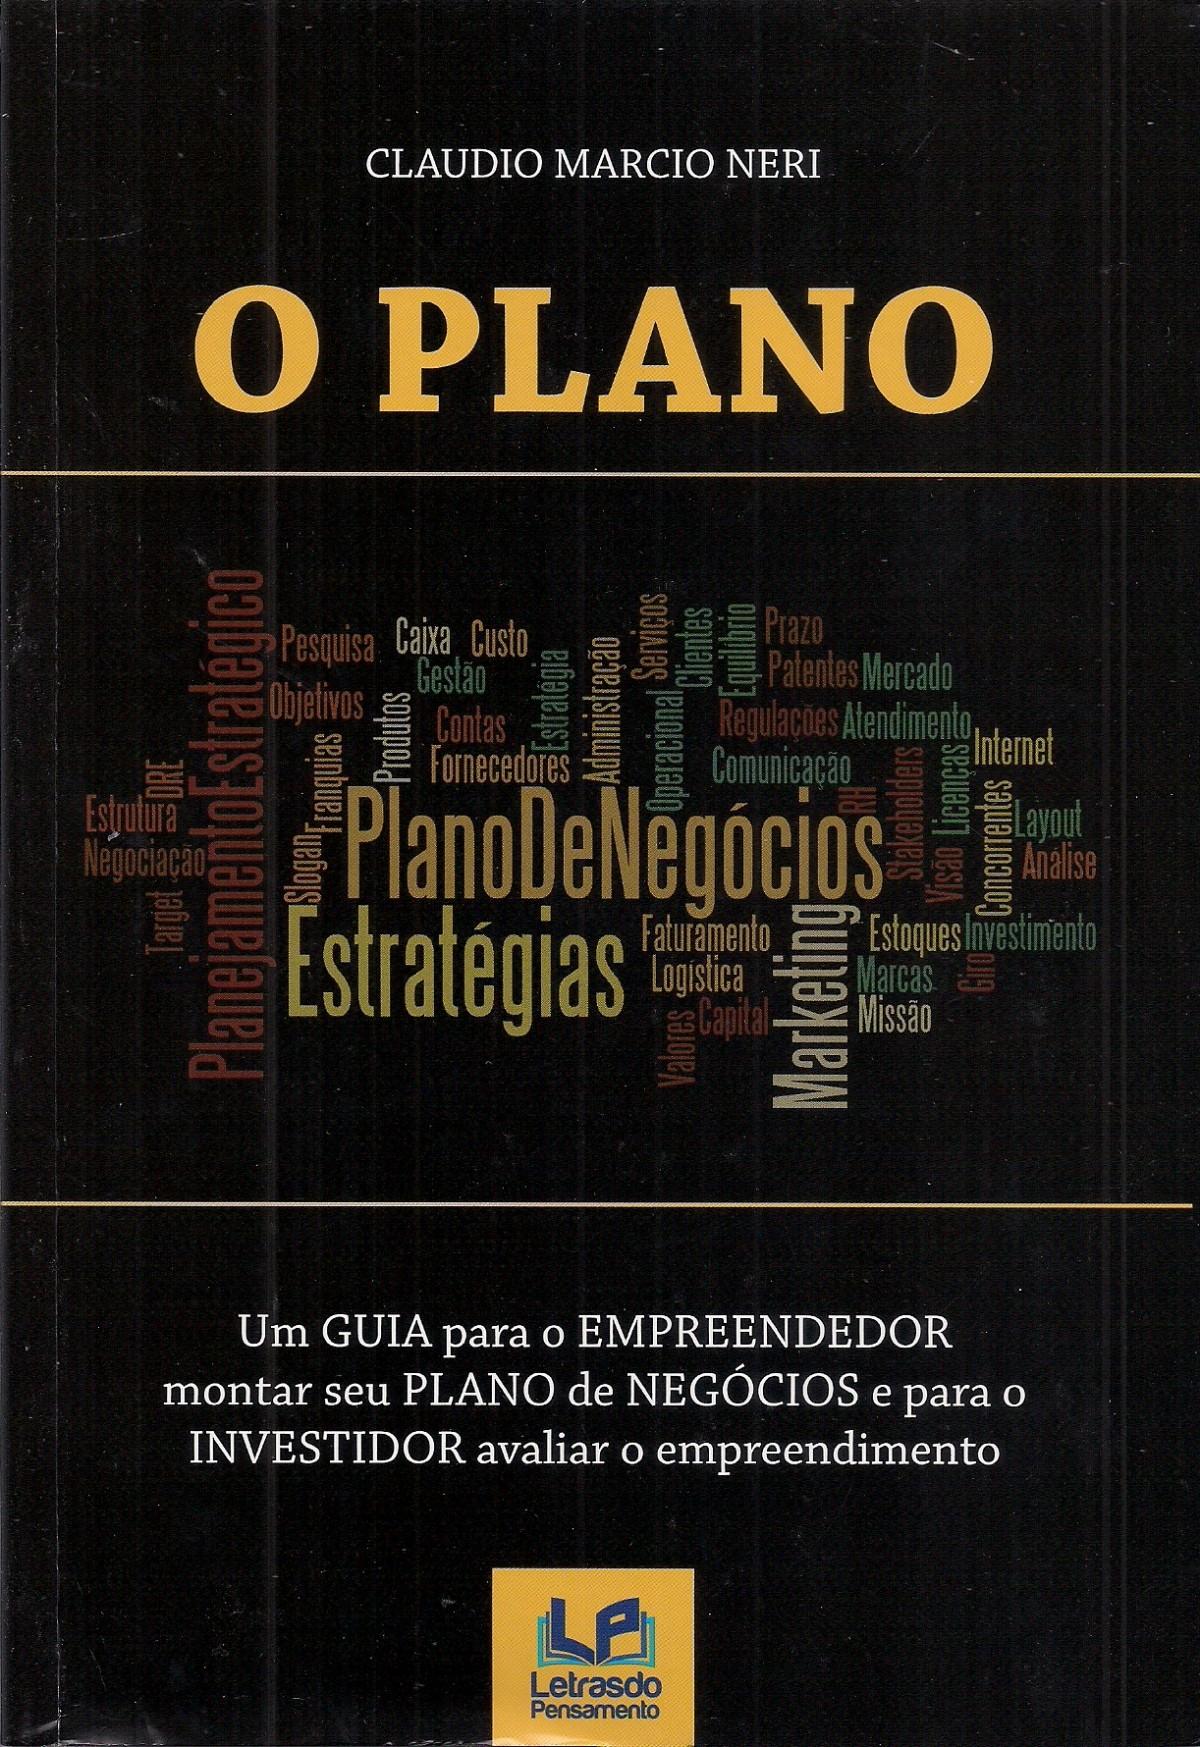 Foto 1 - O Plano